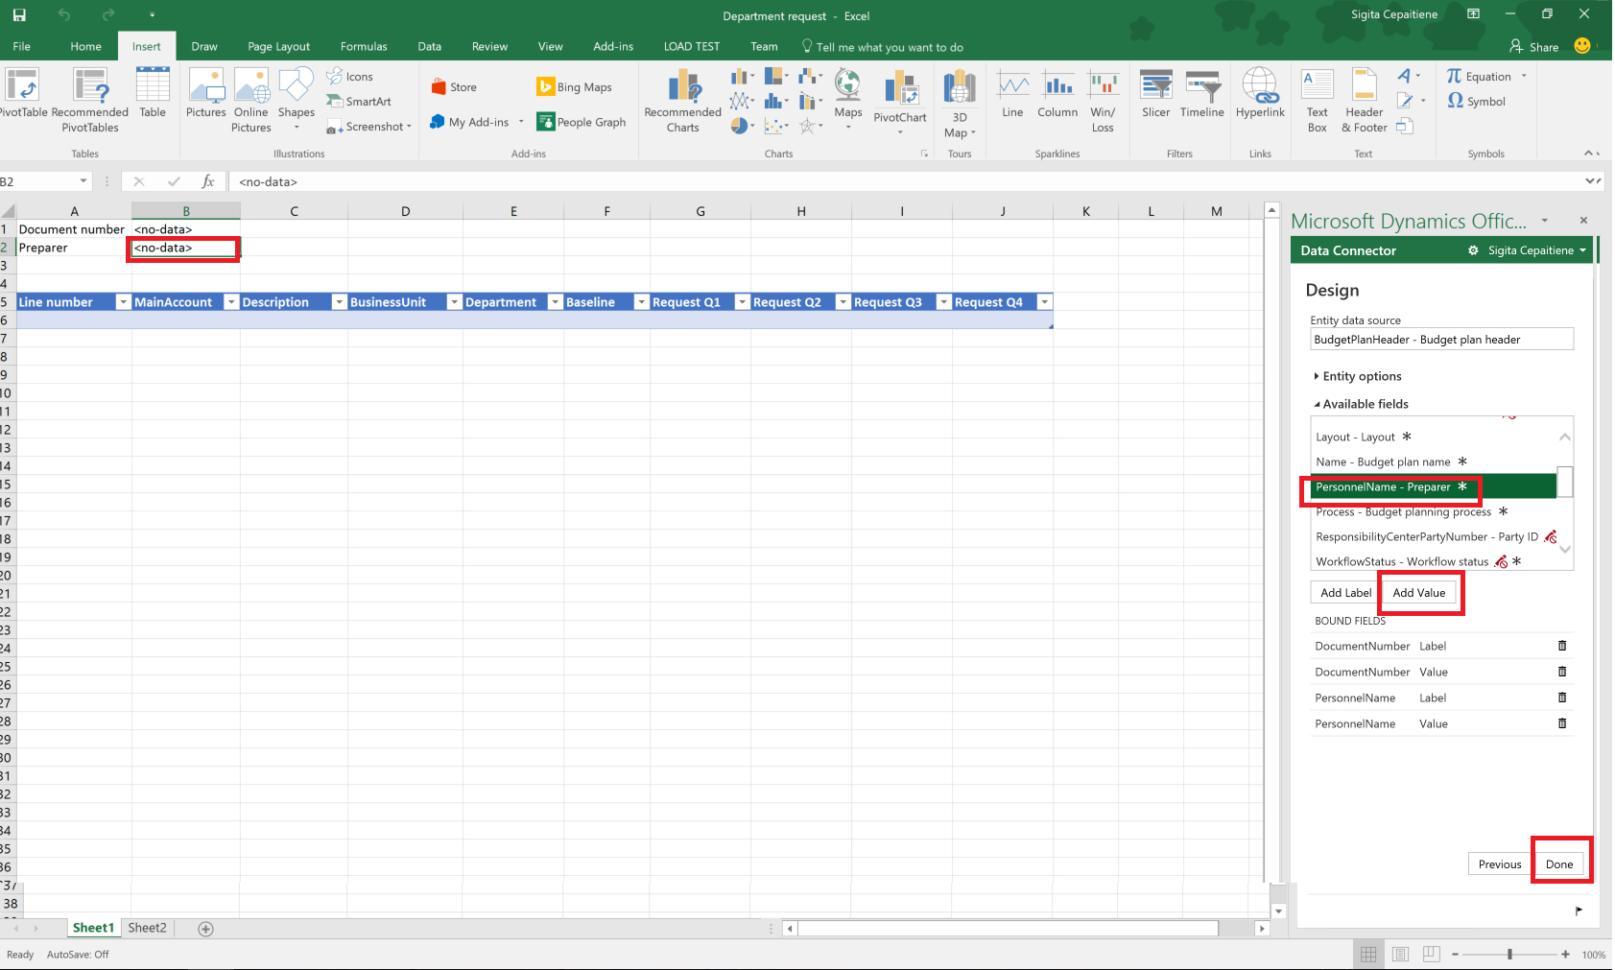 Property Development Spreadsheet Template Uk Regarding Budget Planning Templates For Excel  Finance  Operations